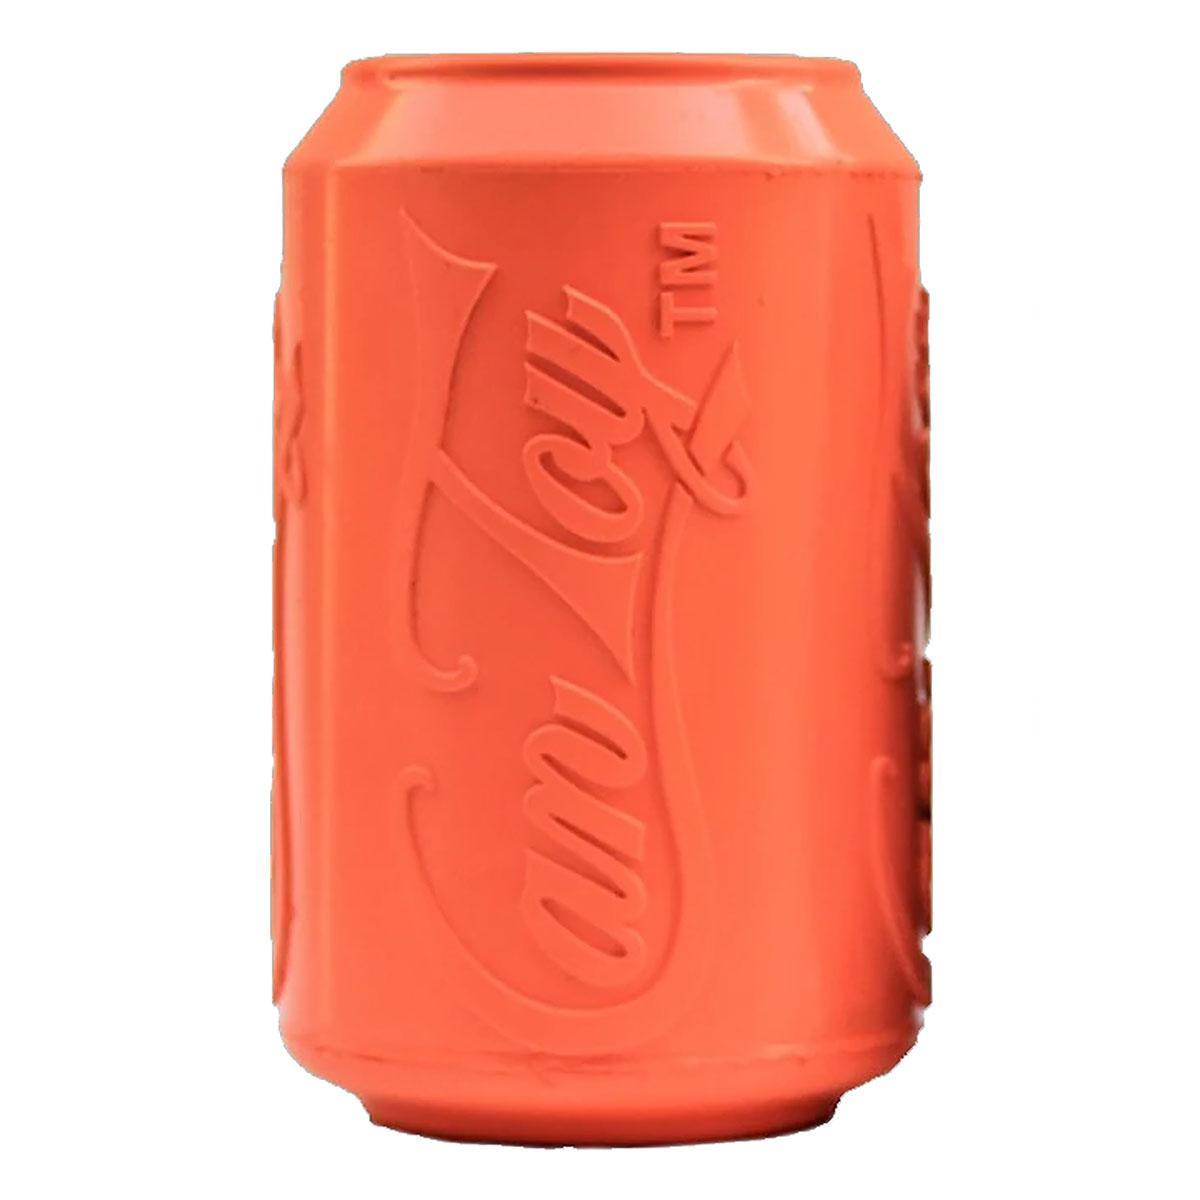 SodaPup Can Dog Toy - Orange